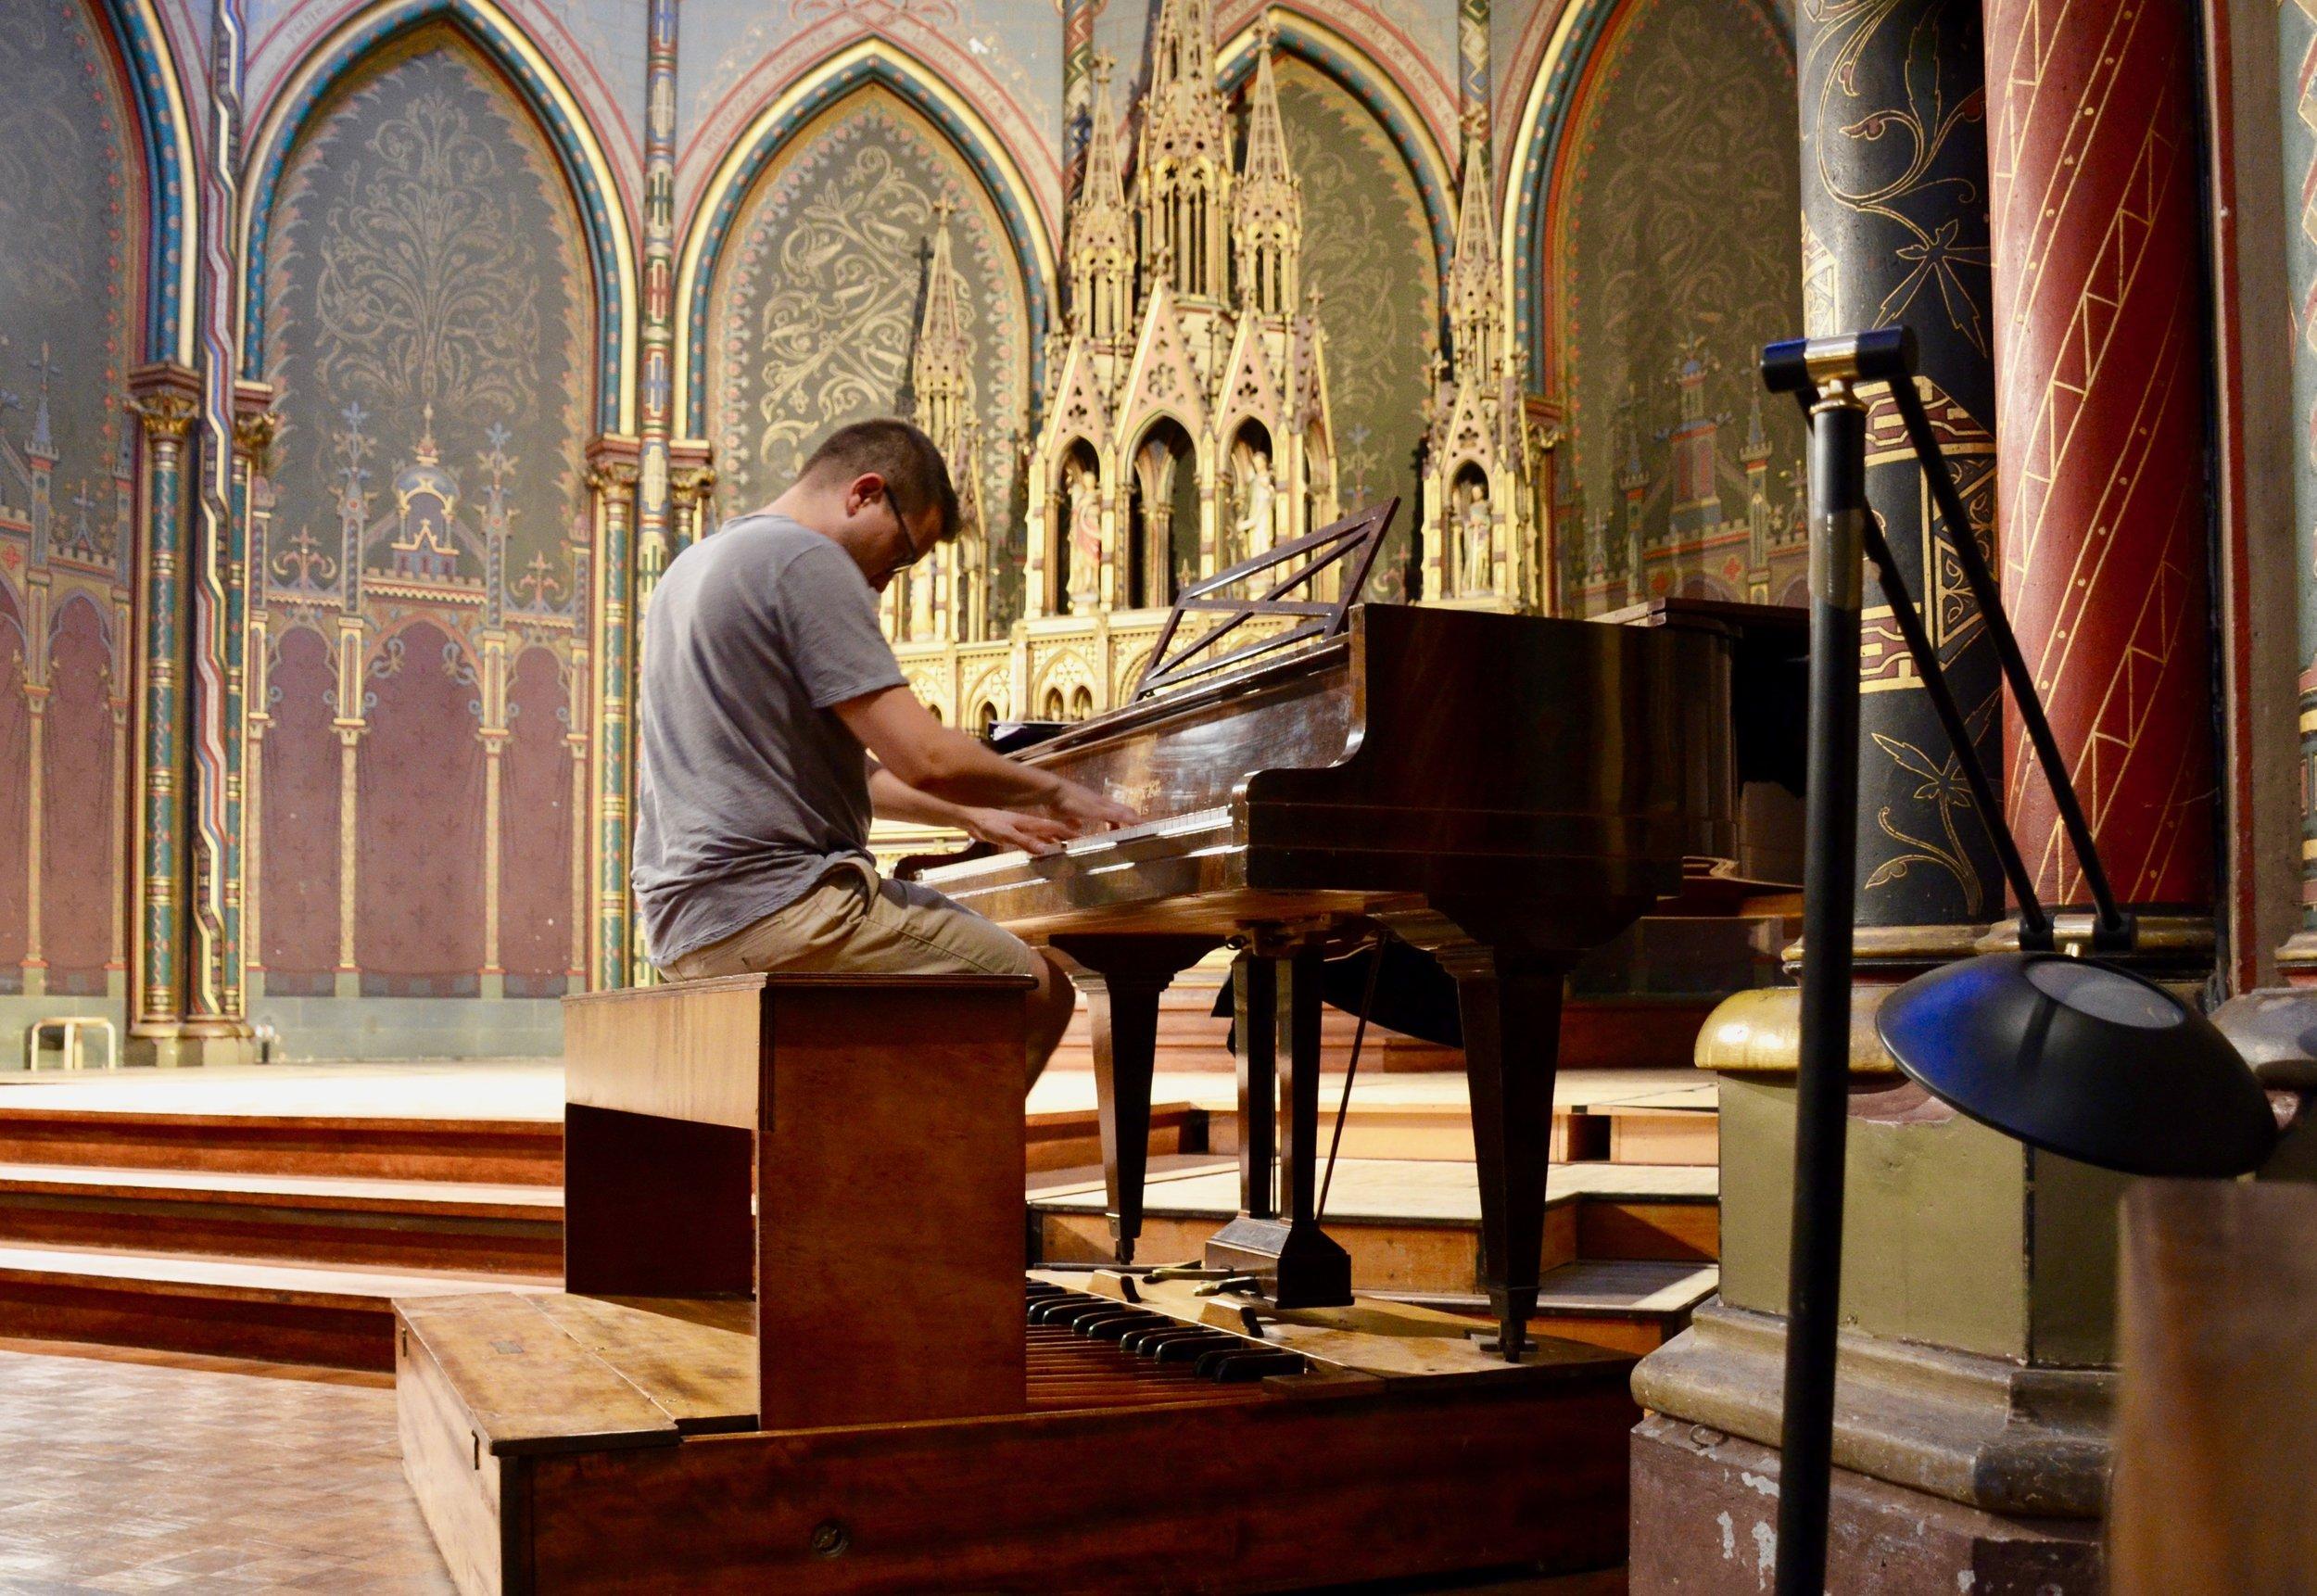 Corey de Tar tries out the pedal piano.